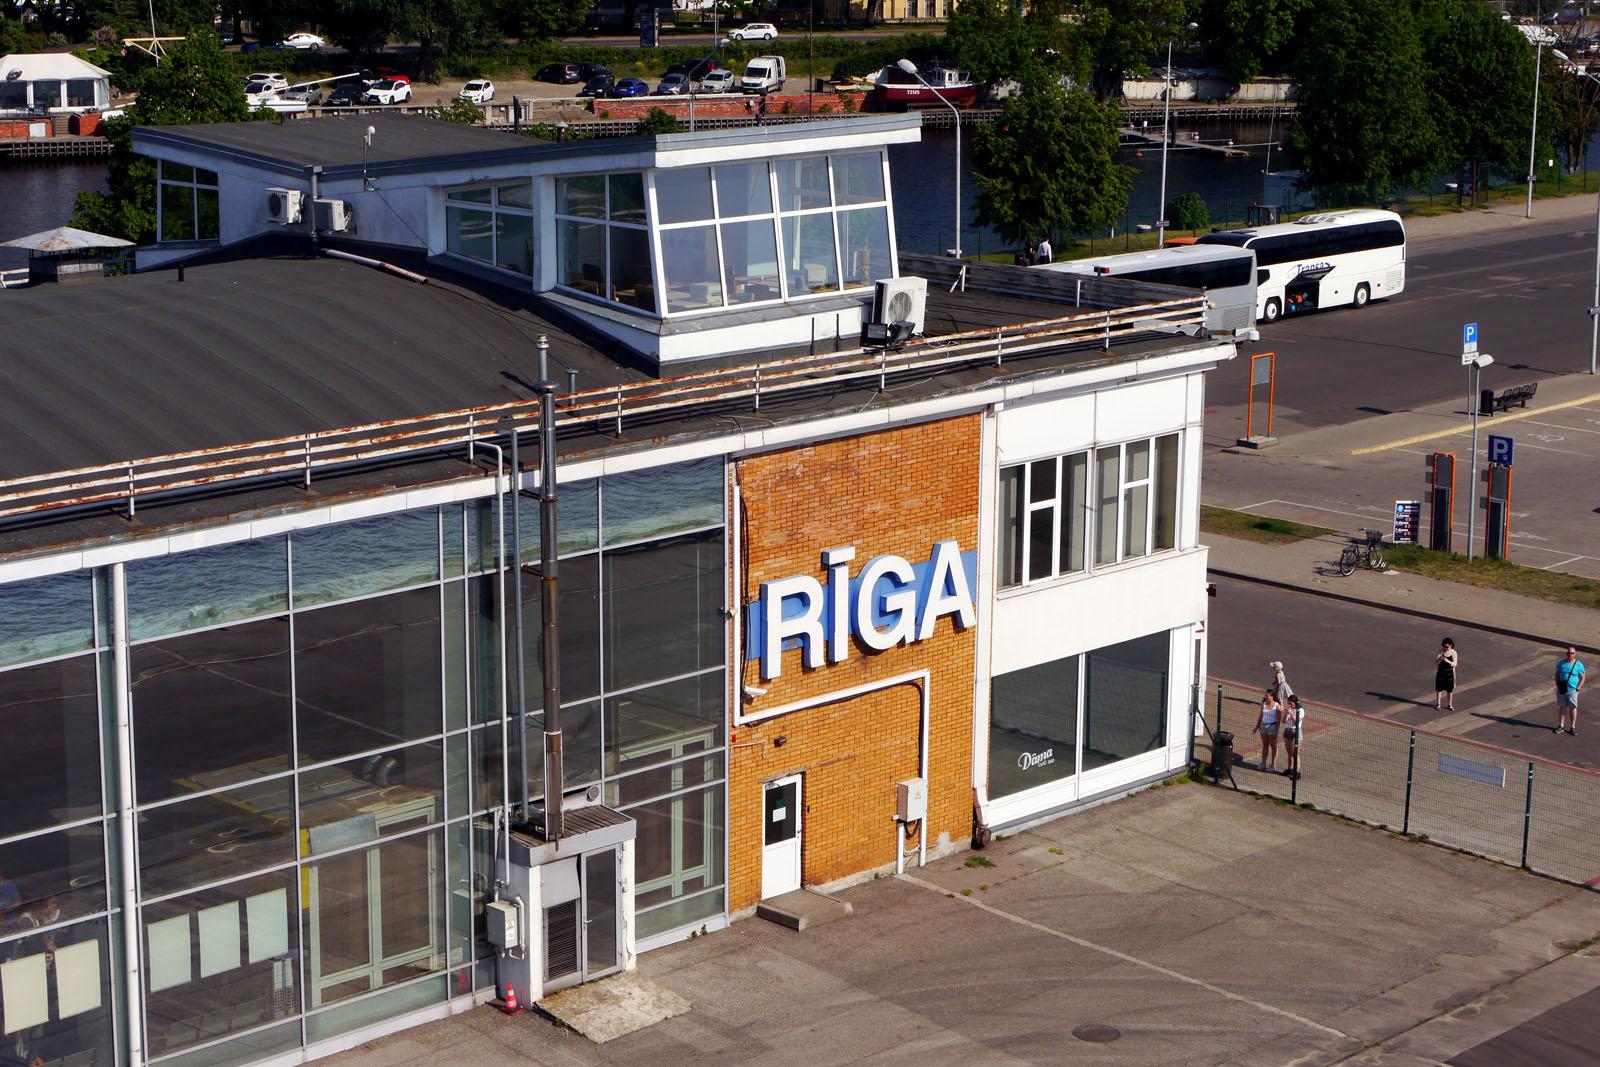 Riga Hafen-Fernwehge-Silja Borghans